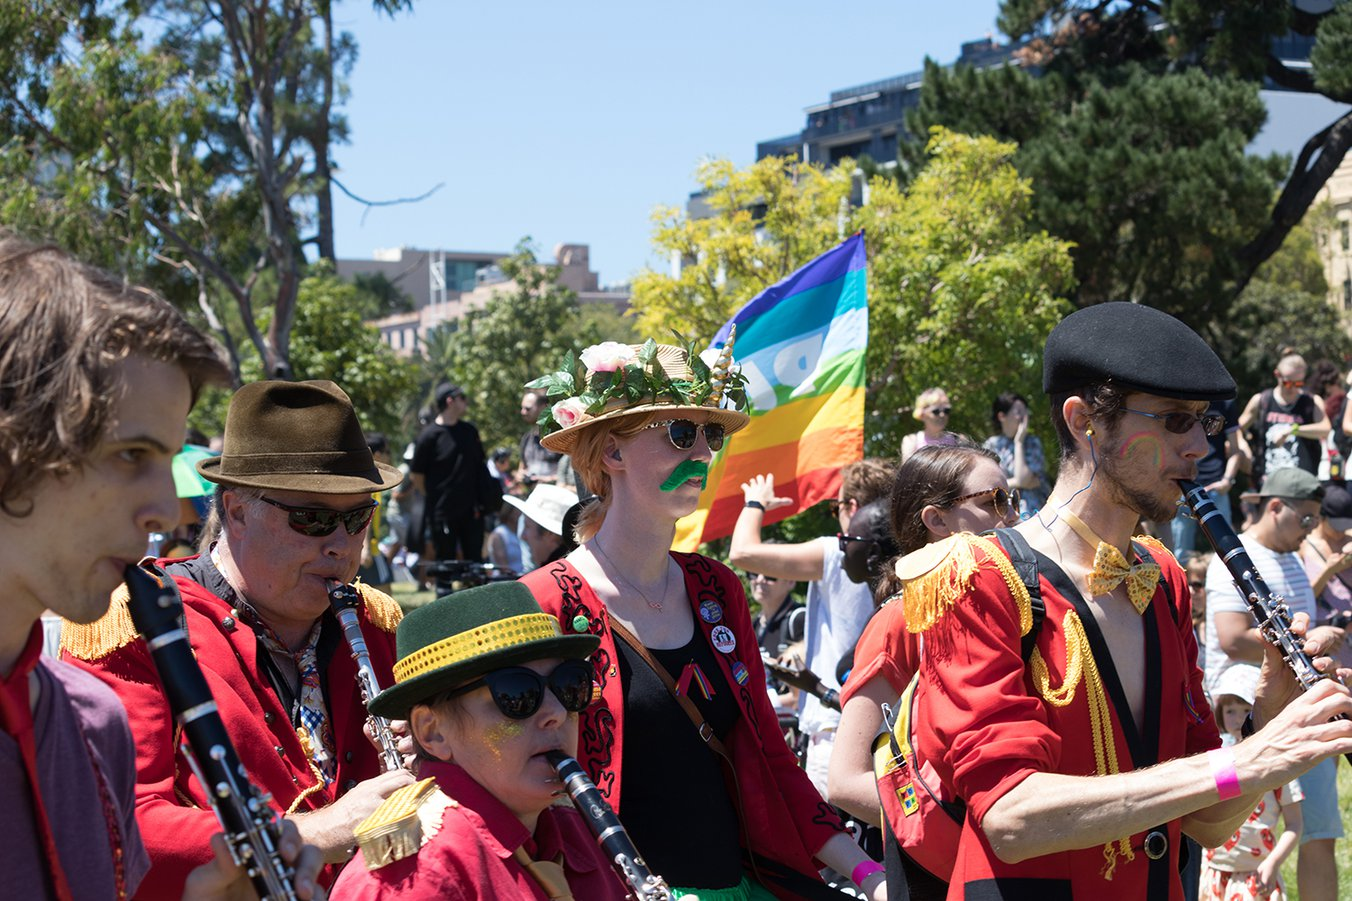 20170202_Pride March_Paul Rees_RE-SIZED_006.jpg